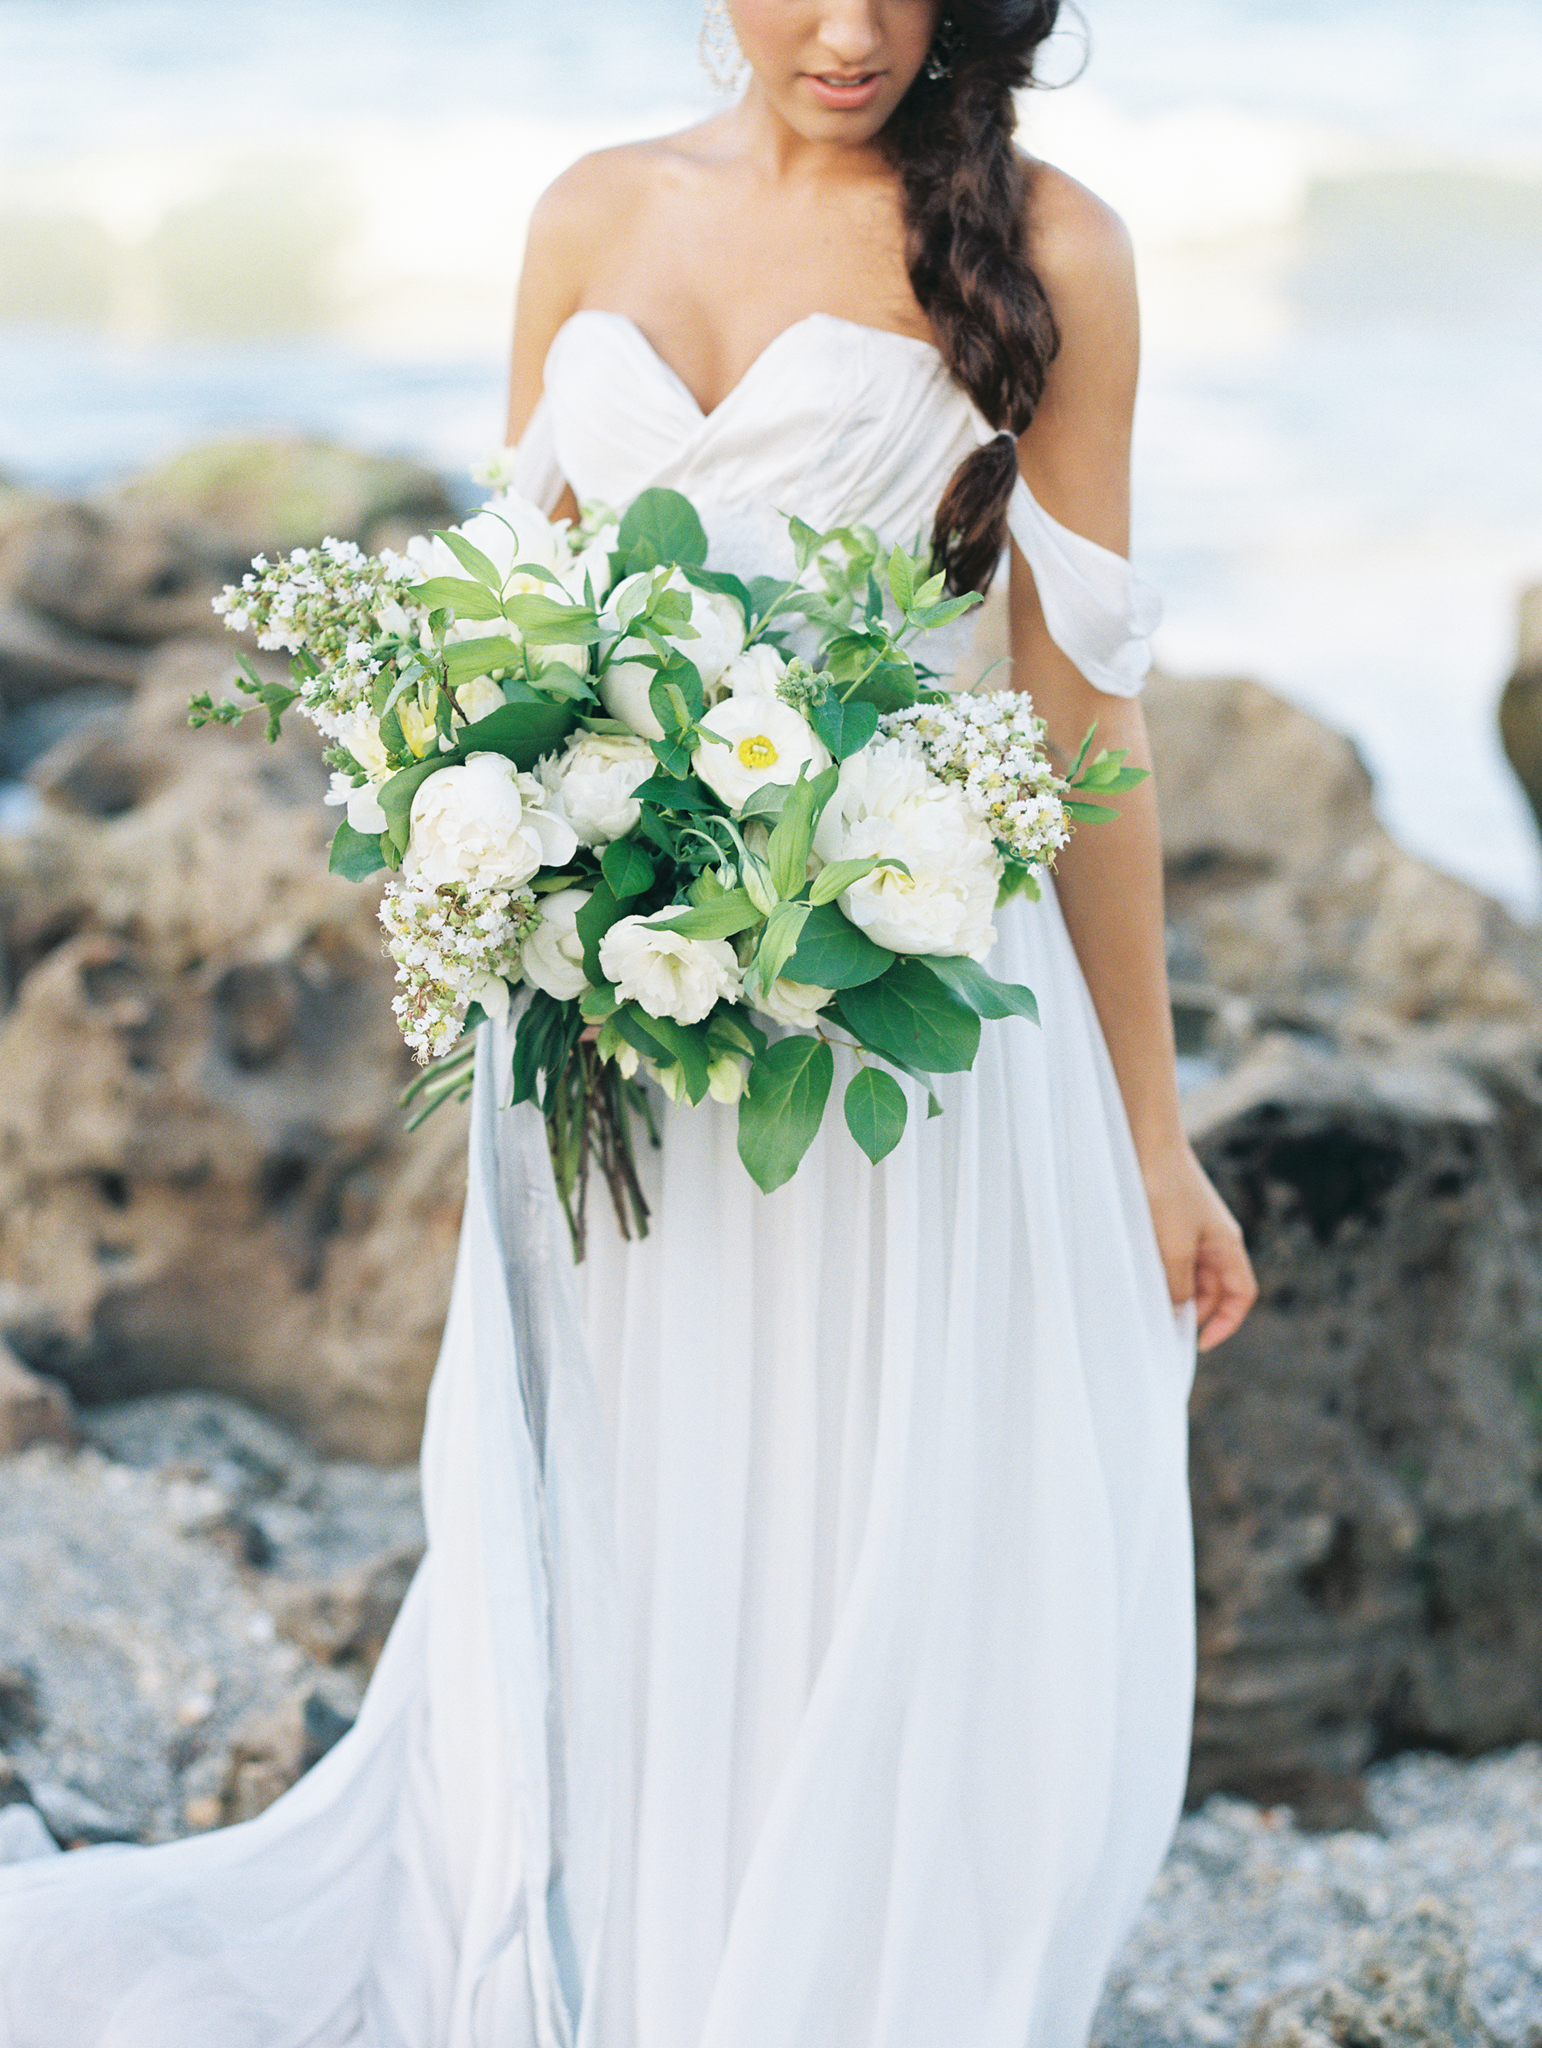 coral cove, jupiter beach FL, palm beach wedding photos, bride with bouquet and wedding dress gown